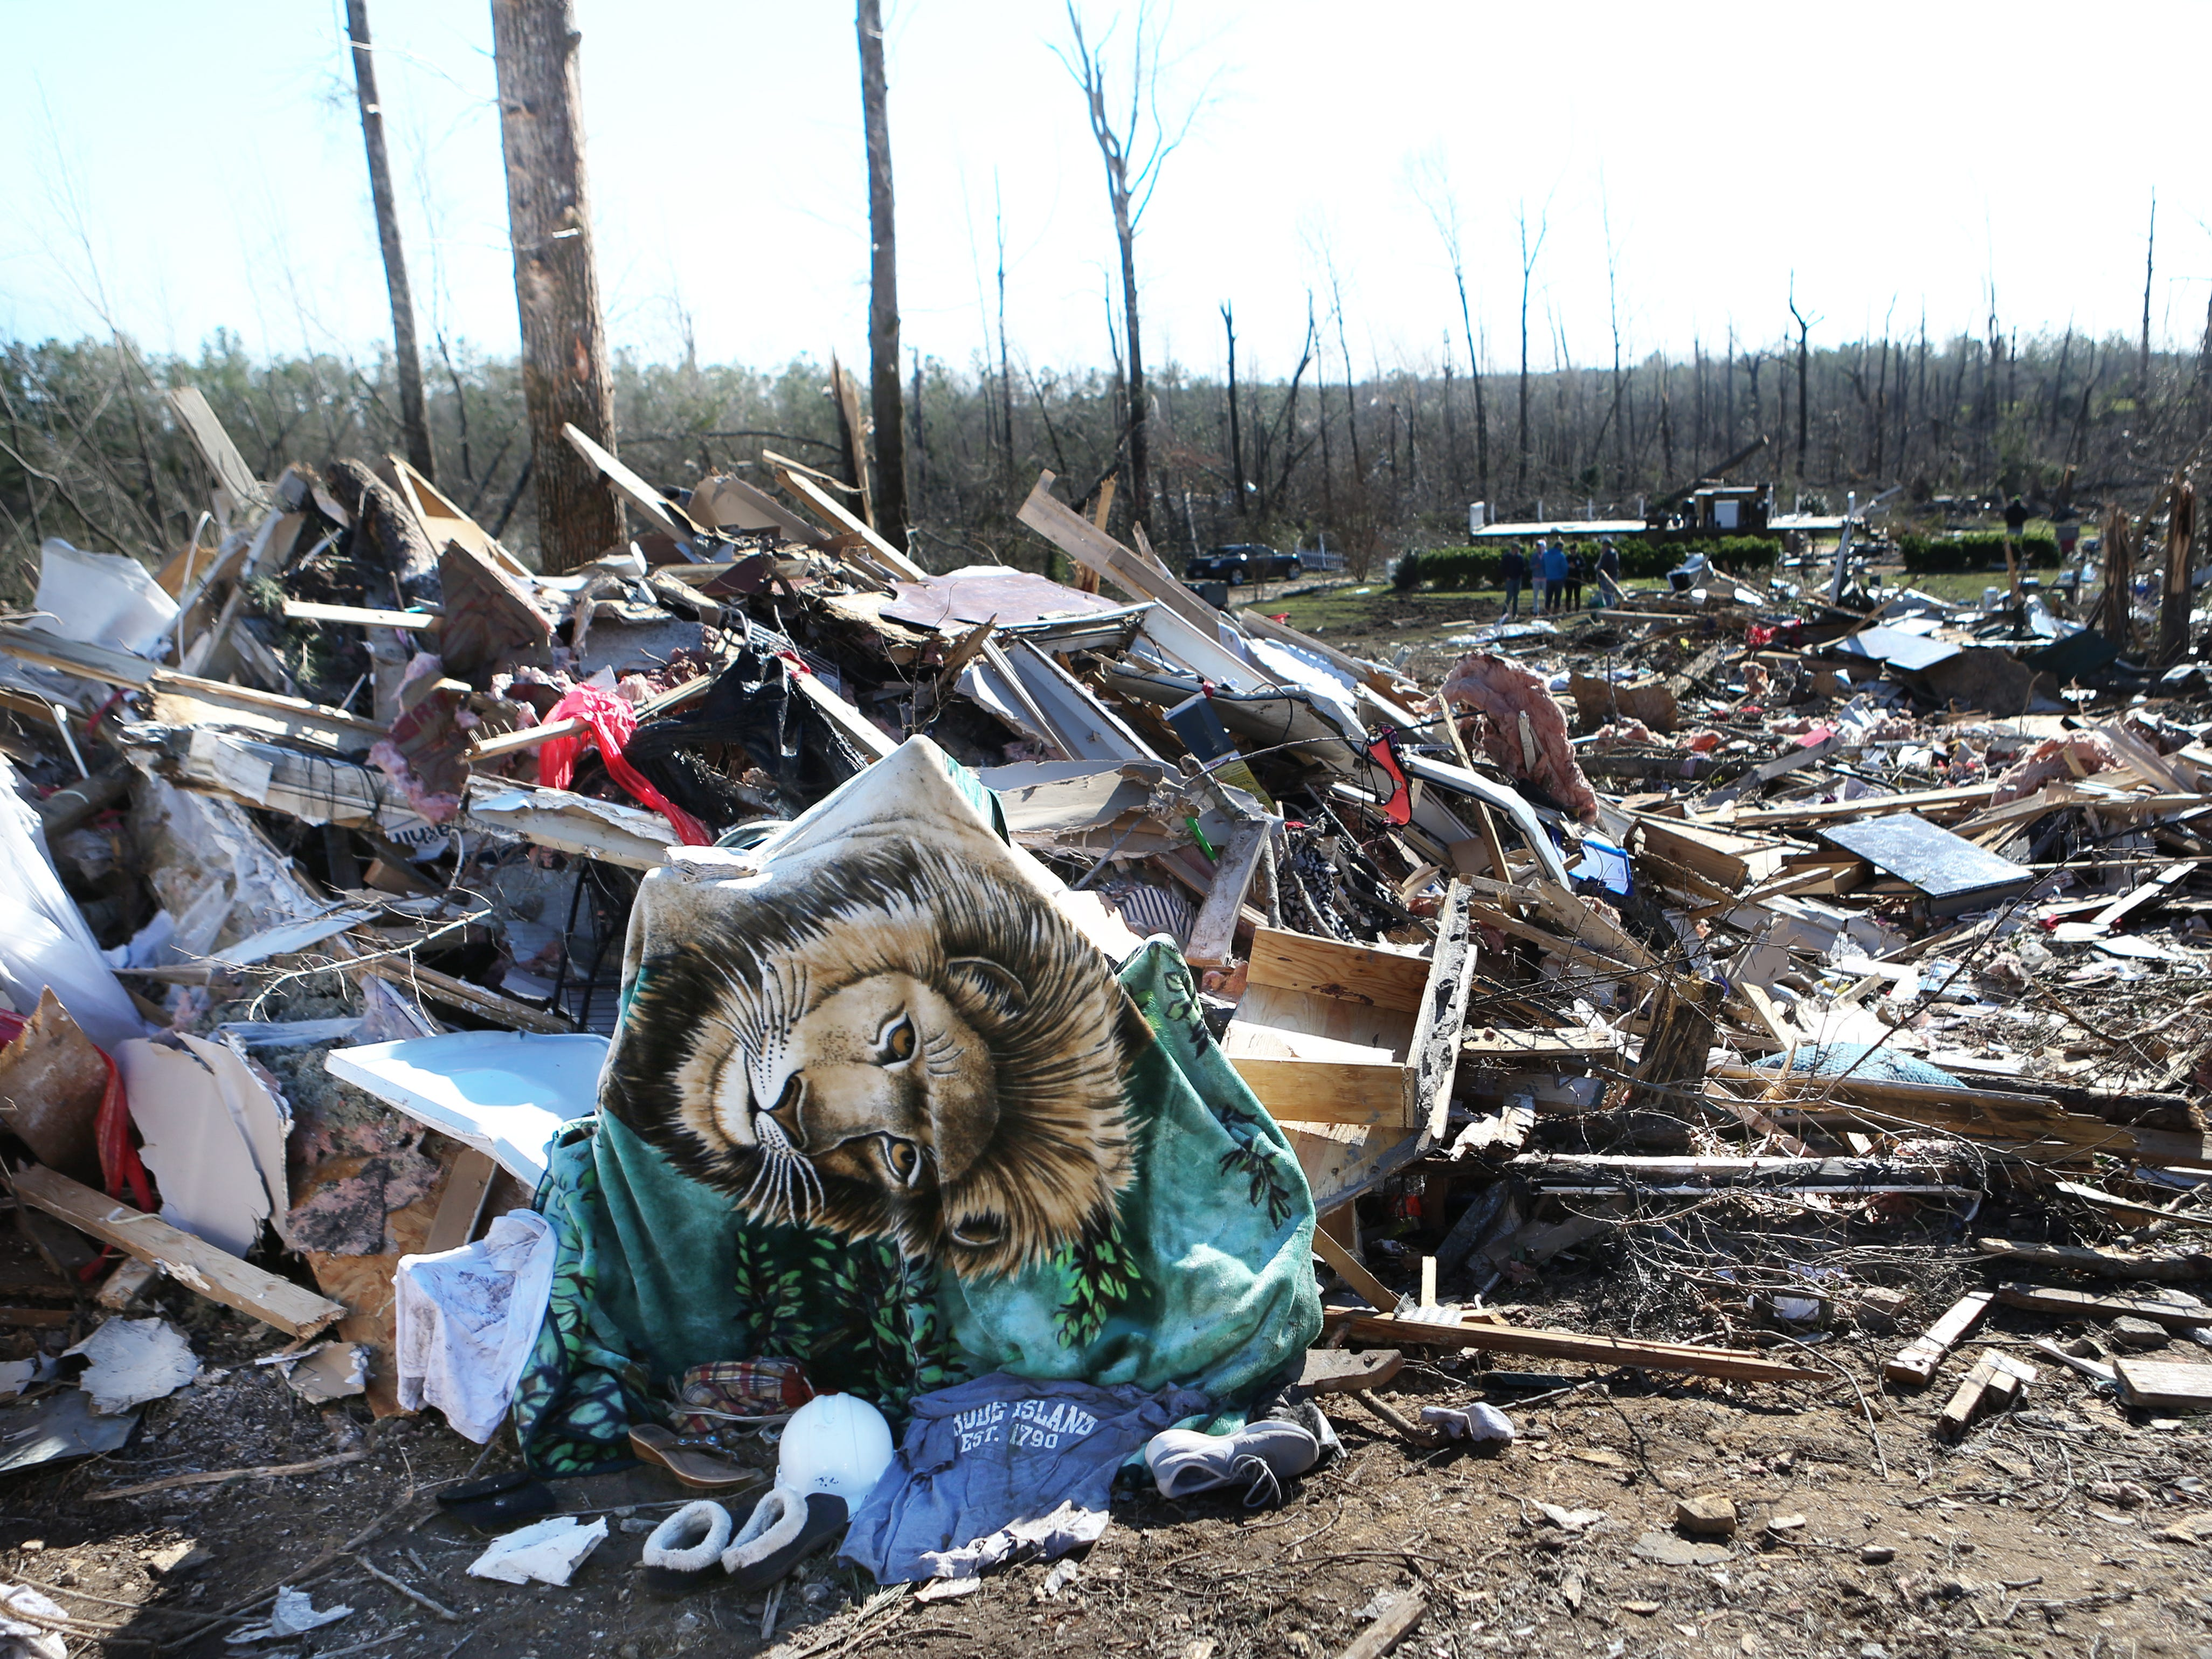 Tornado damage in Lee County, Ala. on March 5, 2019.